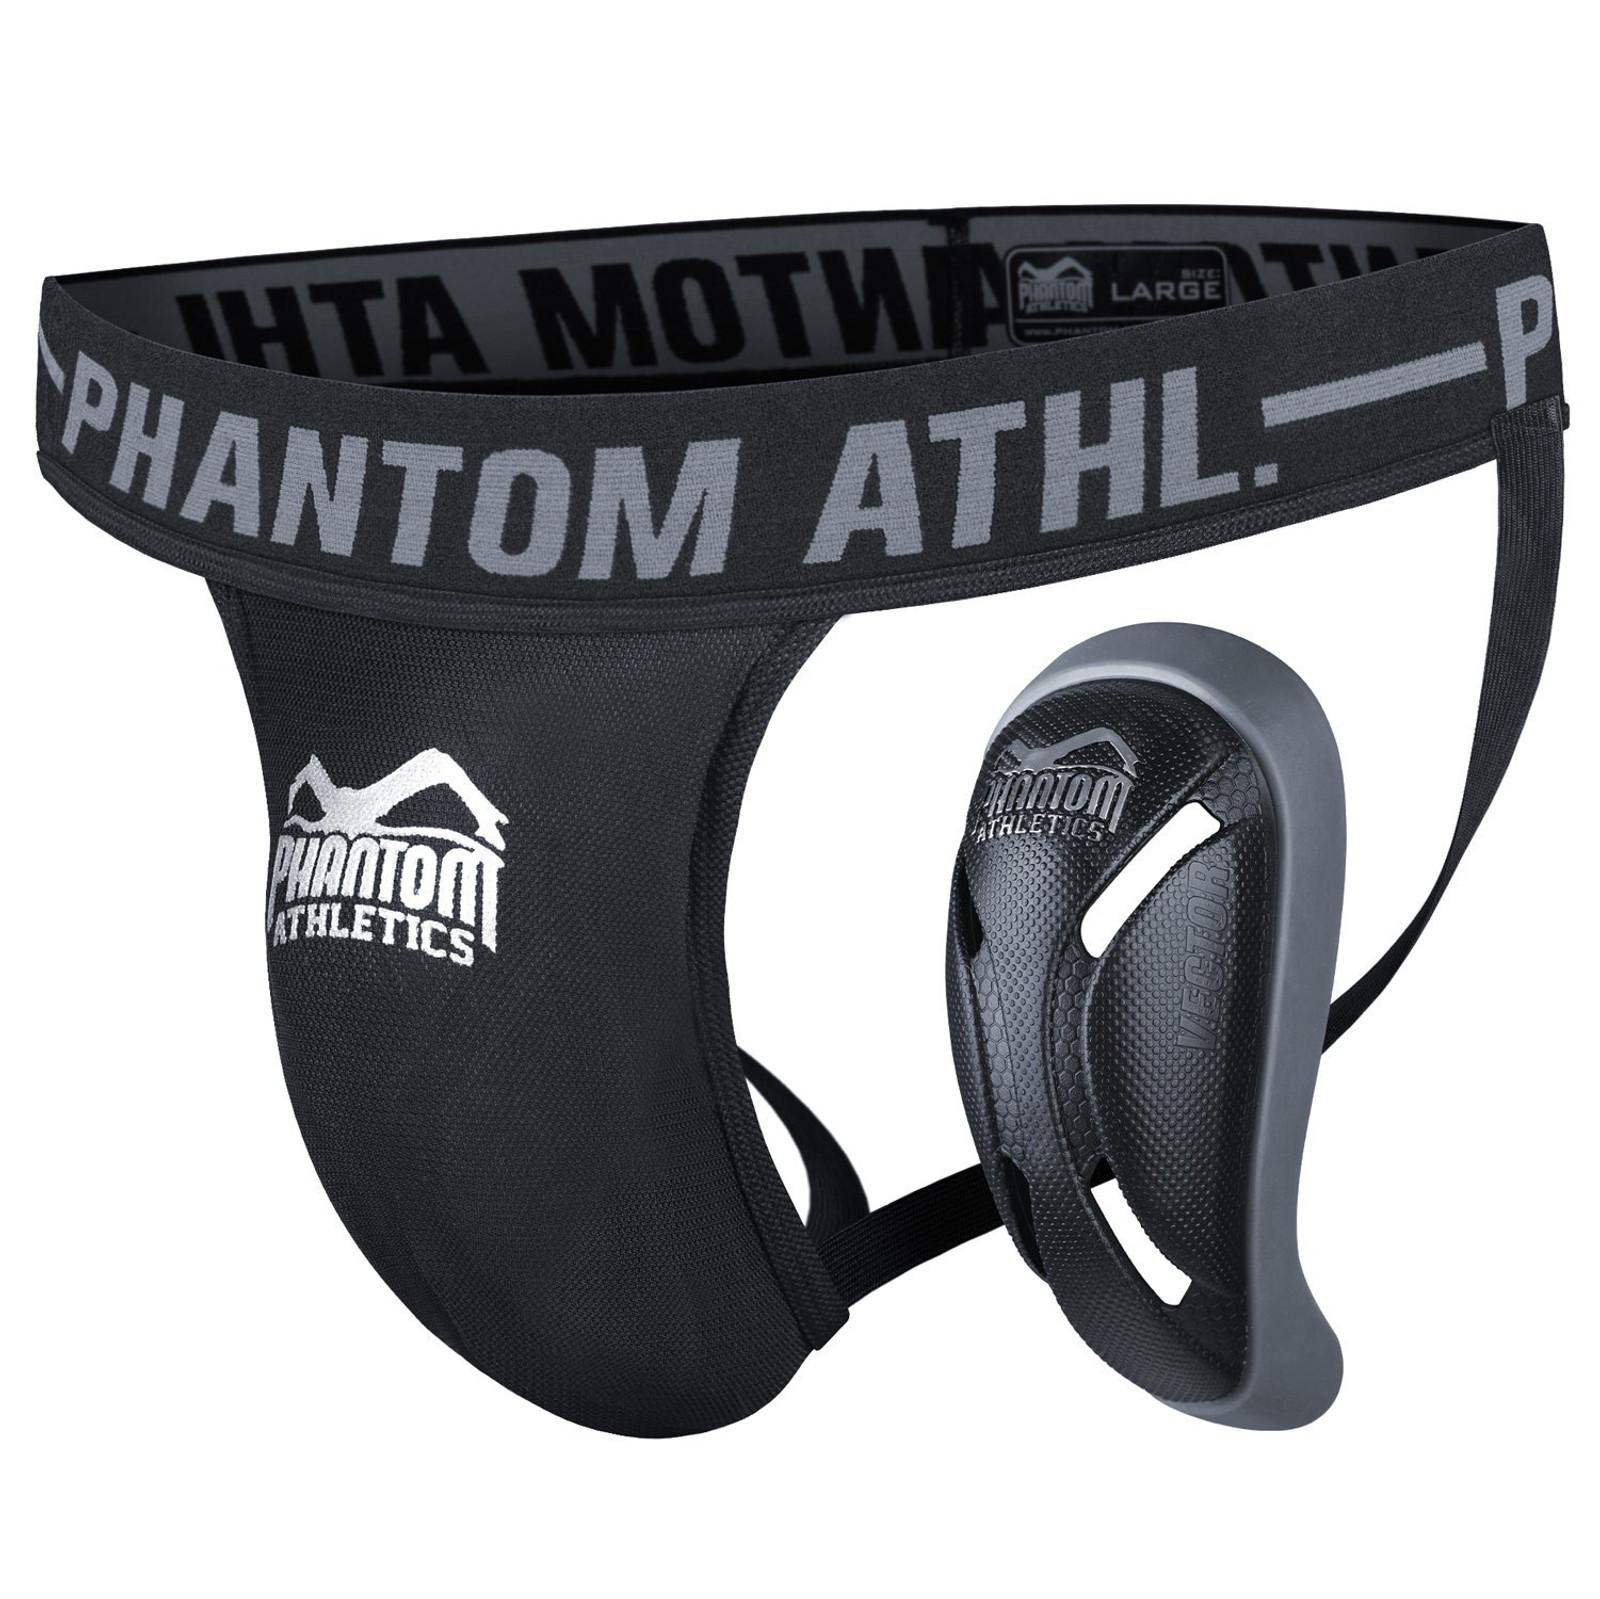 Phantom Athletics Tiefschutz Vector mit Cup